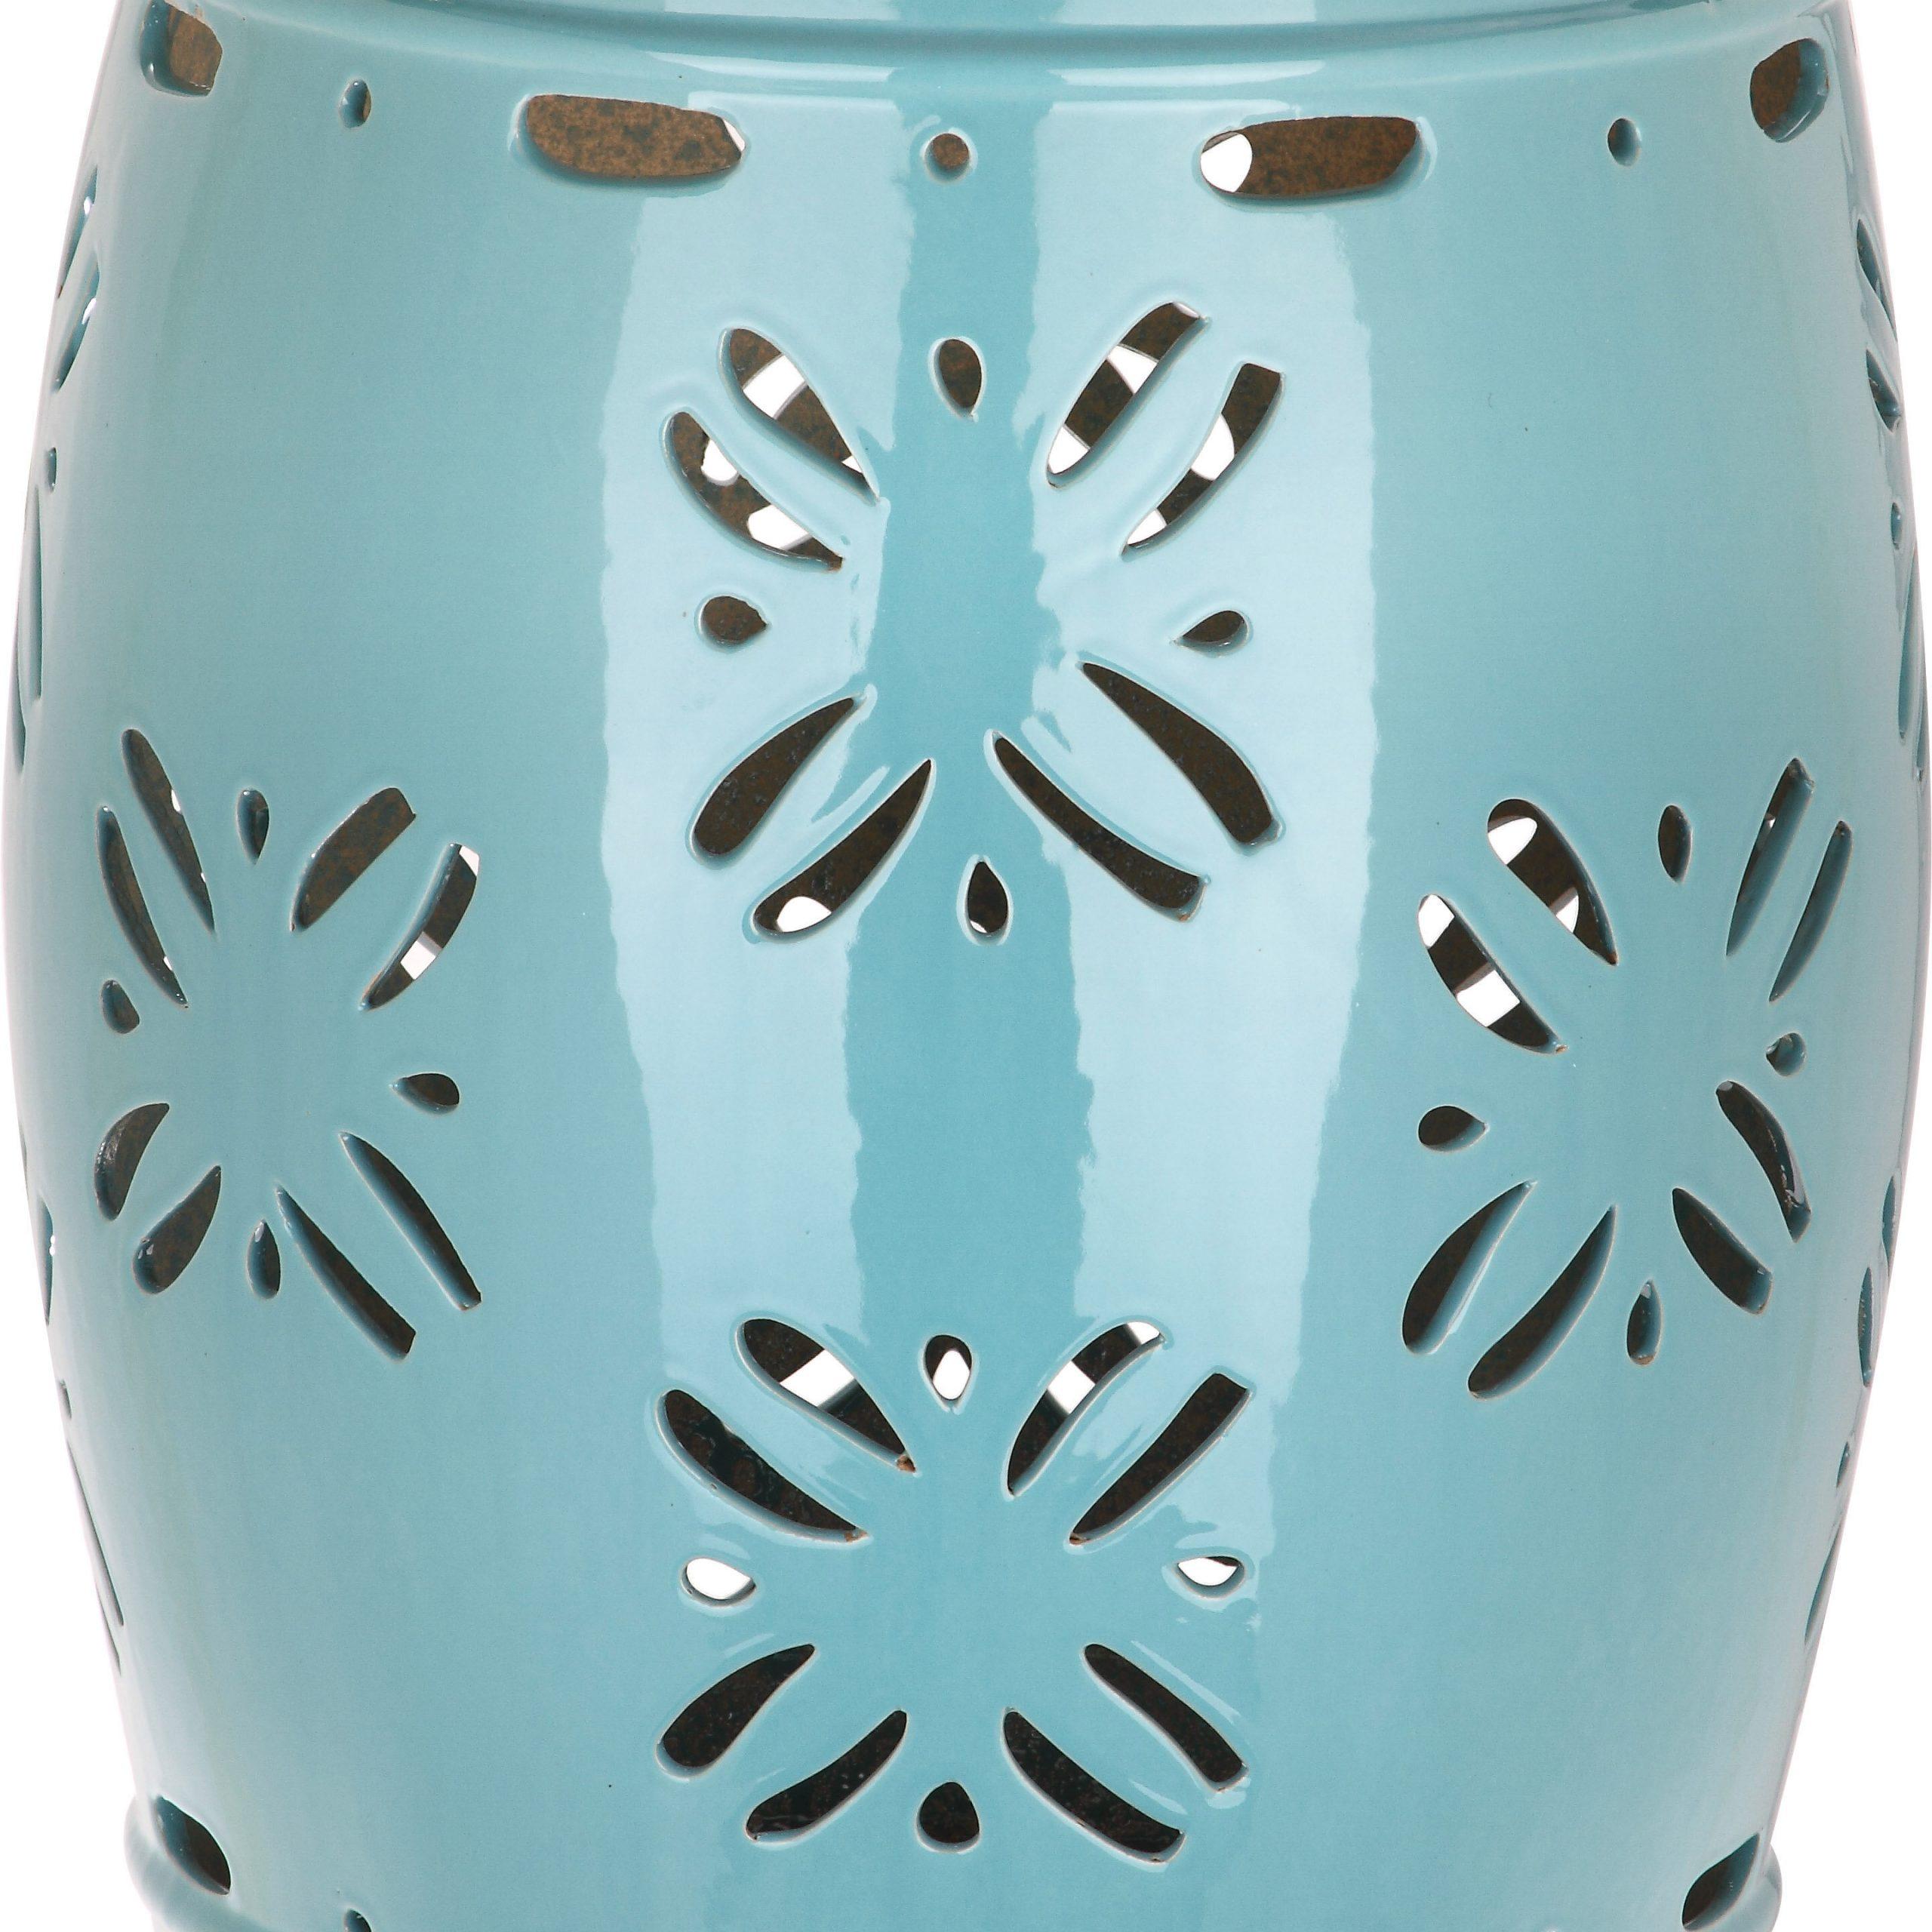 Blue & Green Garden Stools You'Ll Love In 2020 | Wayfair Regarding Murphy Ceramic Garden Stools (View 7 of 25)